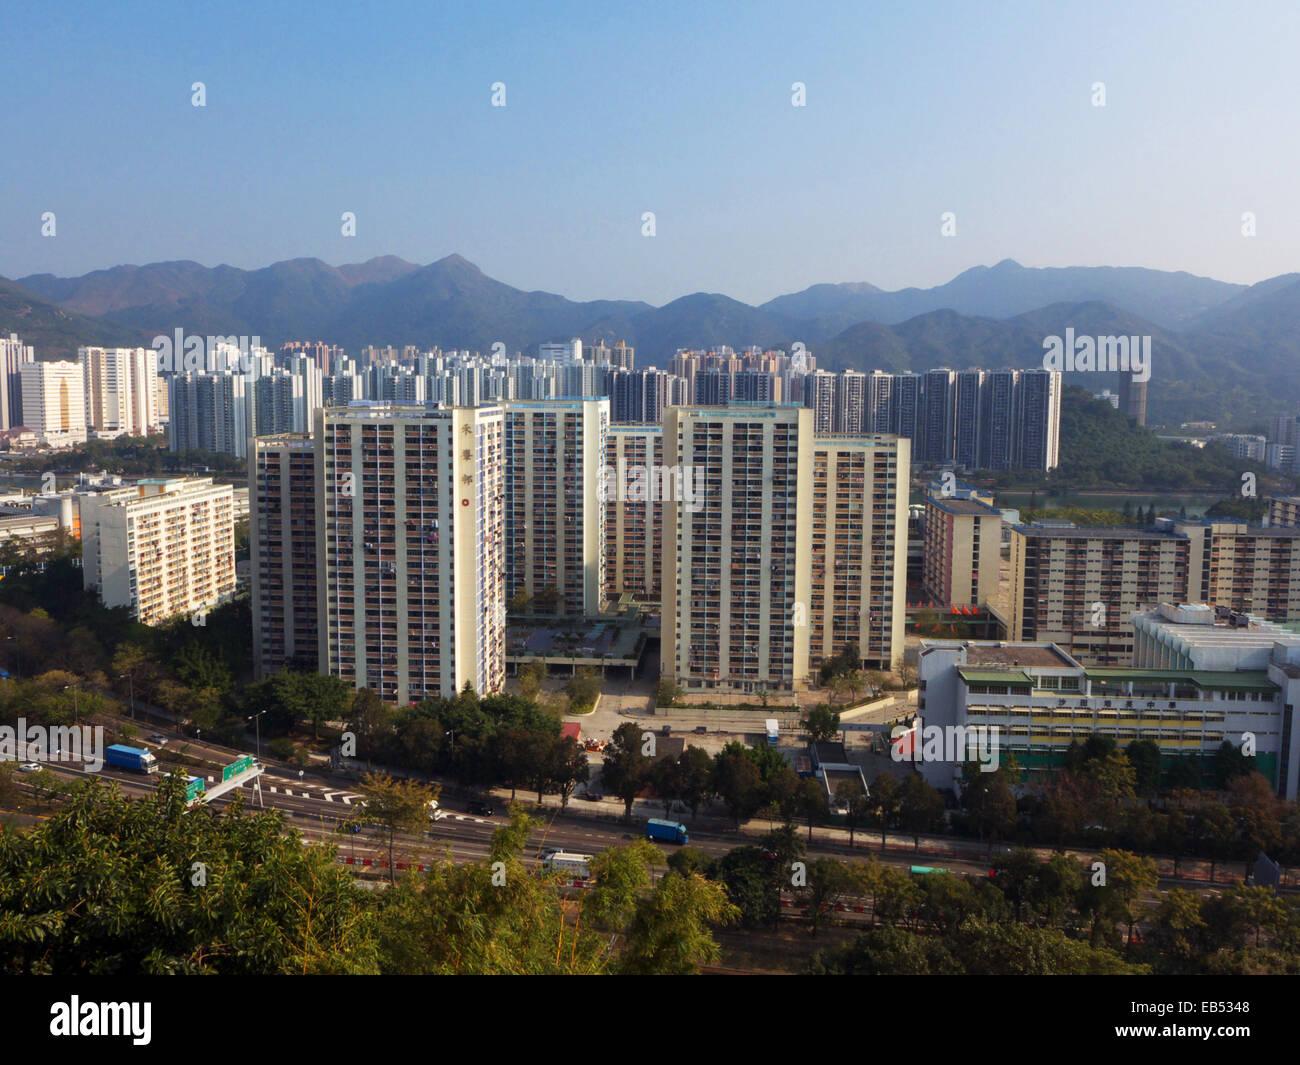 China Hong Kong Public Housing estate Apartment block in Shatin New Territories - Stock Image